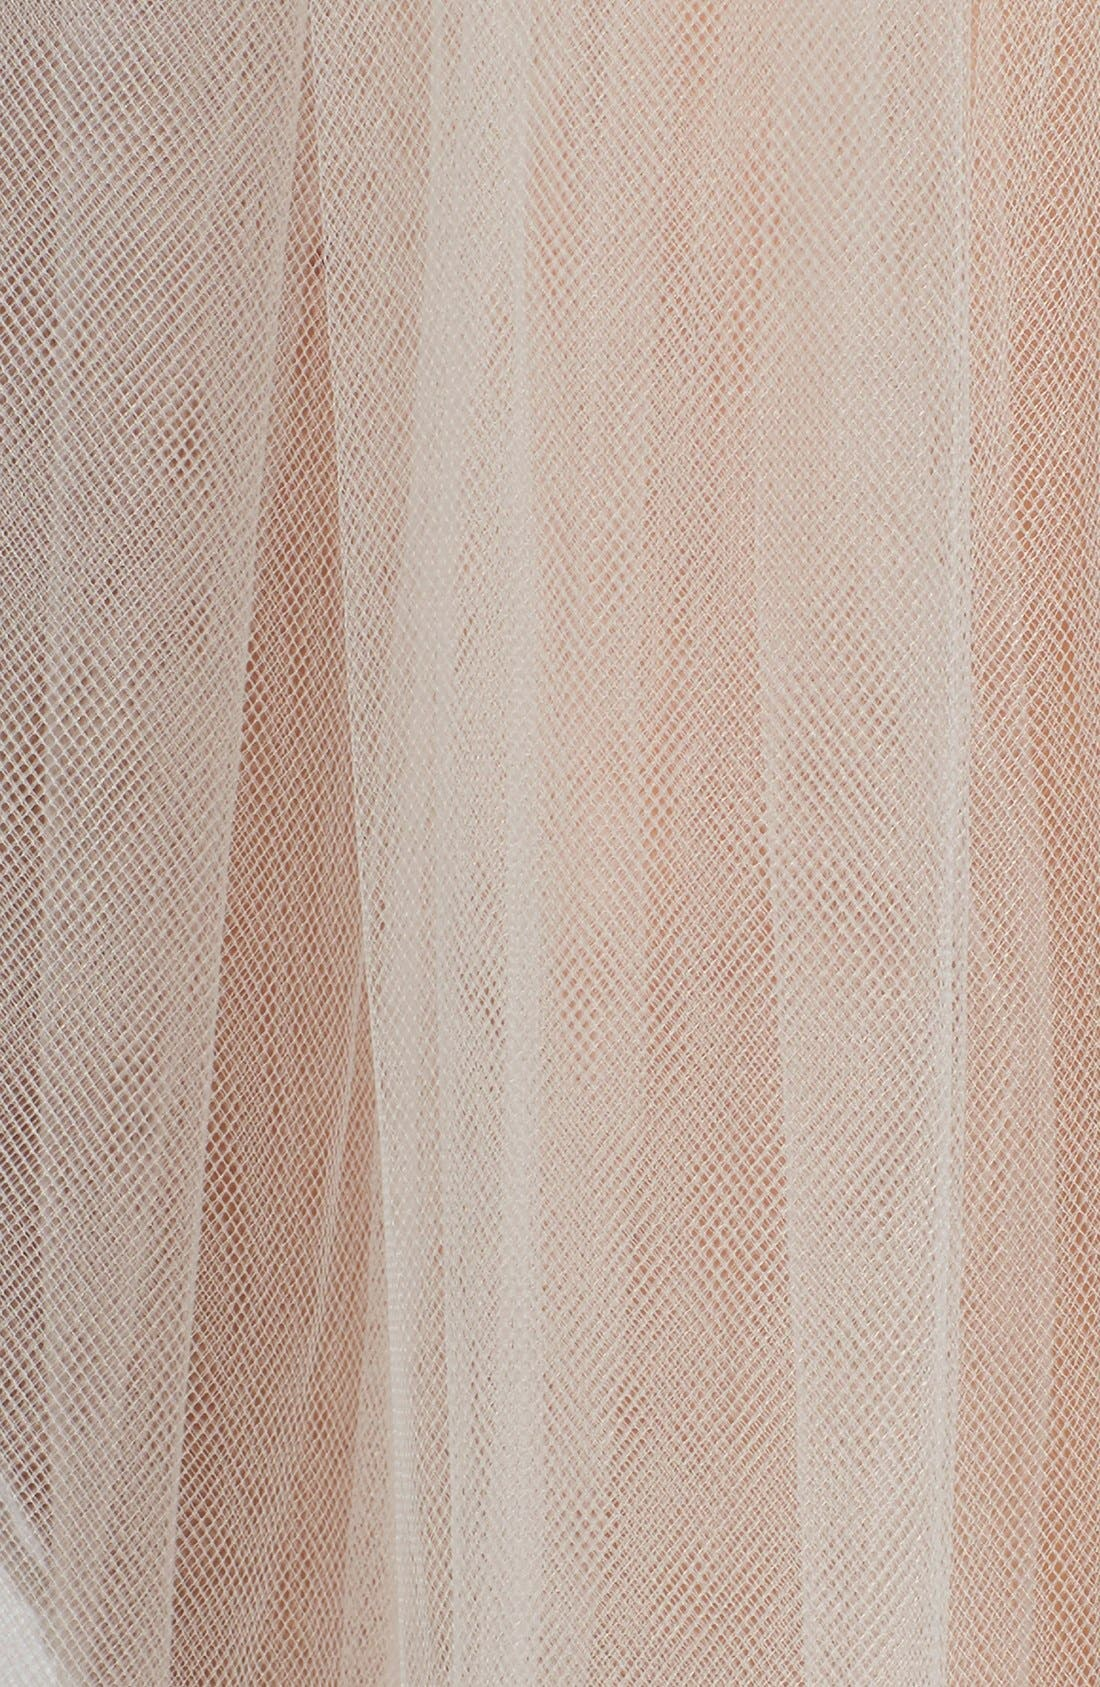 Alternate Image 5  - Brides & Hairpins 'Christina' Tulle Veil